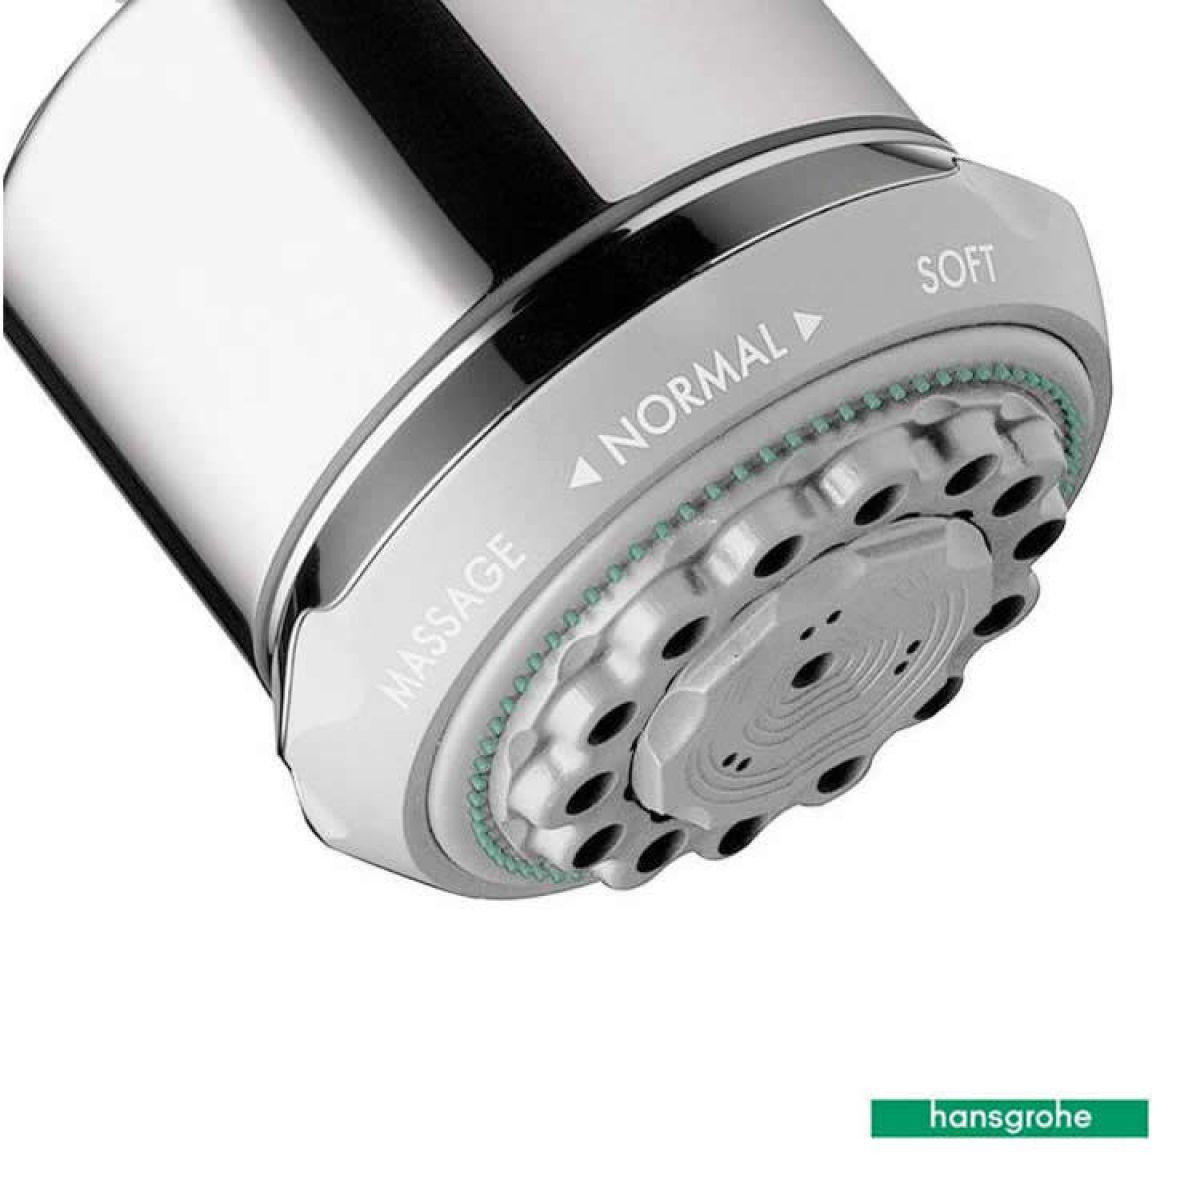 Hansgrohe Clubmaster Kiwa Shower Head - Shower Designs